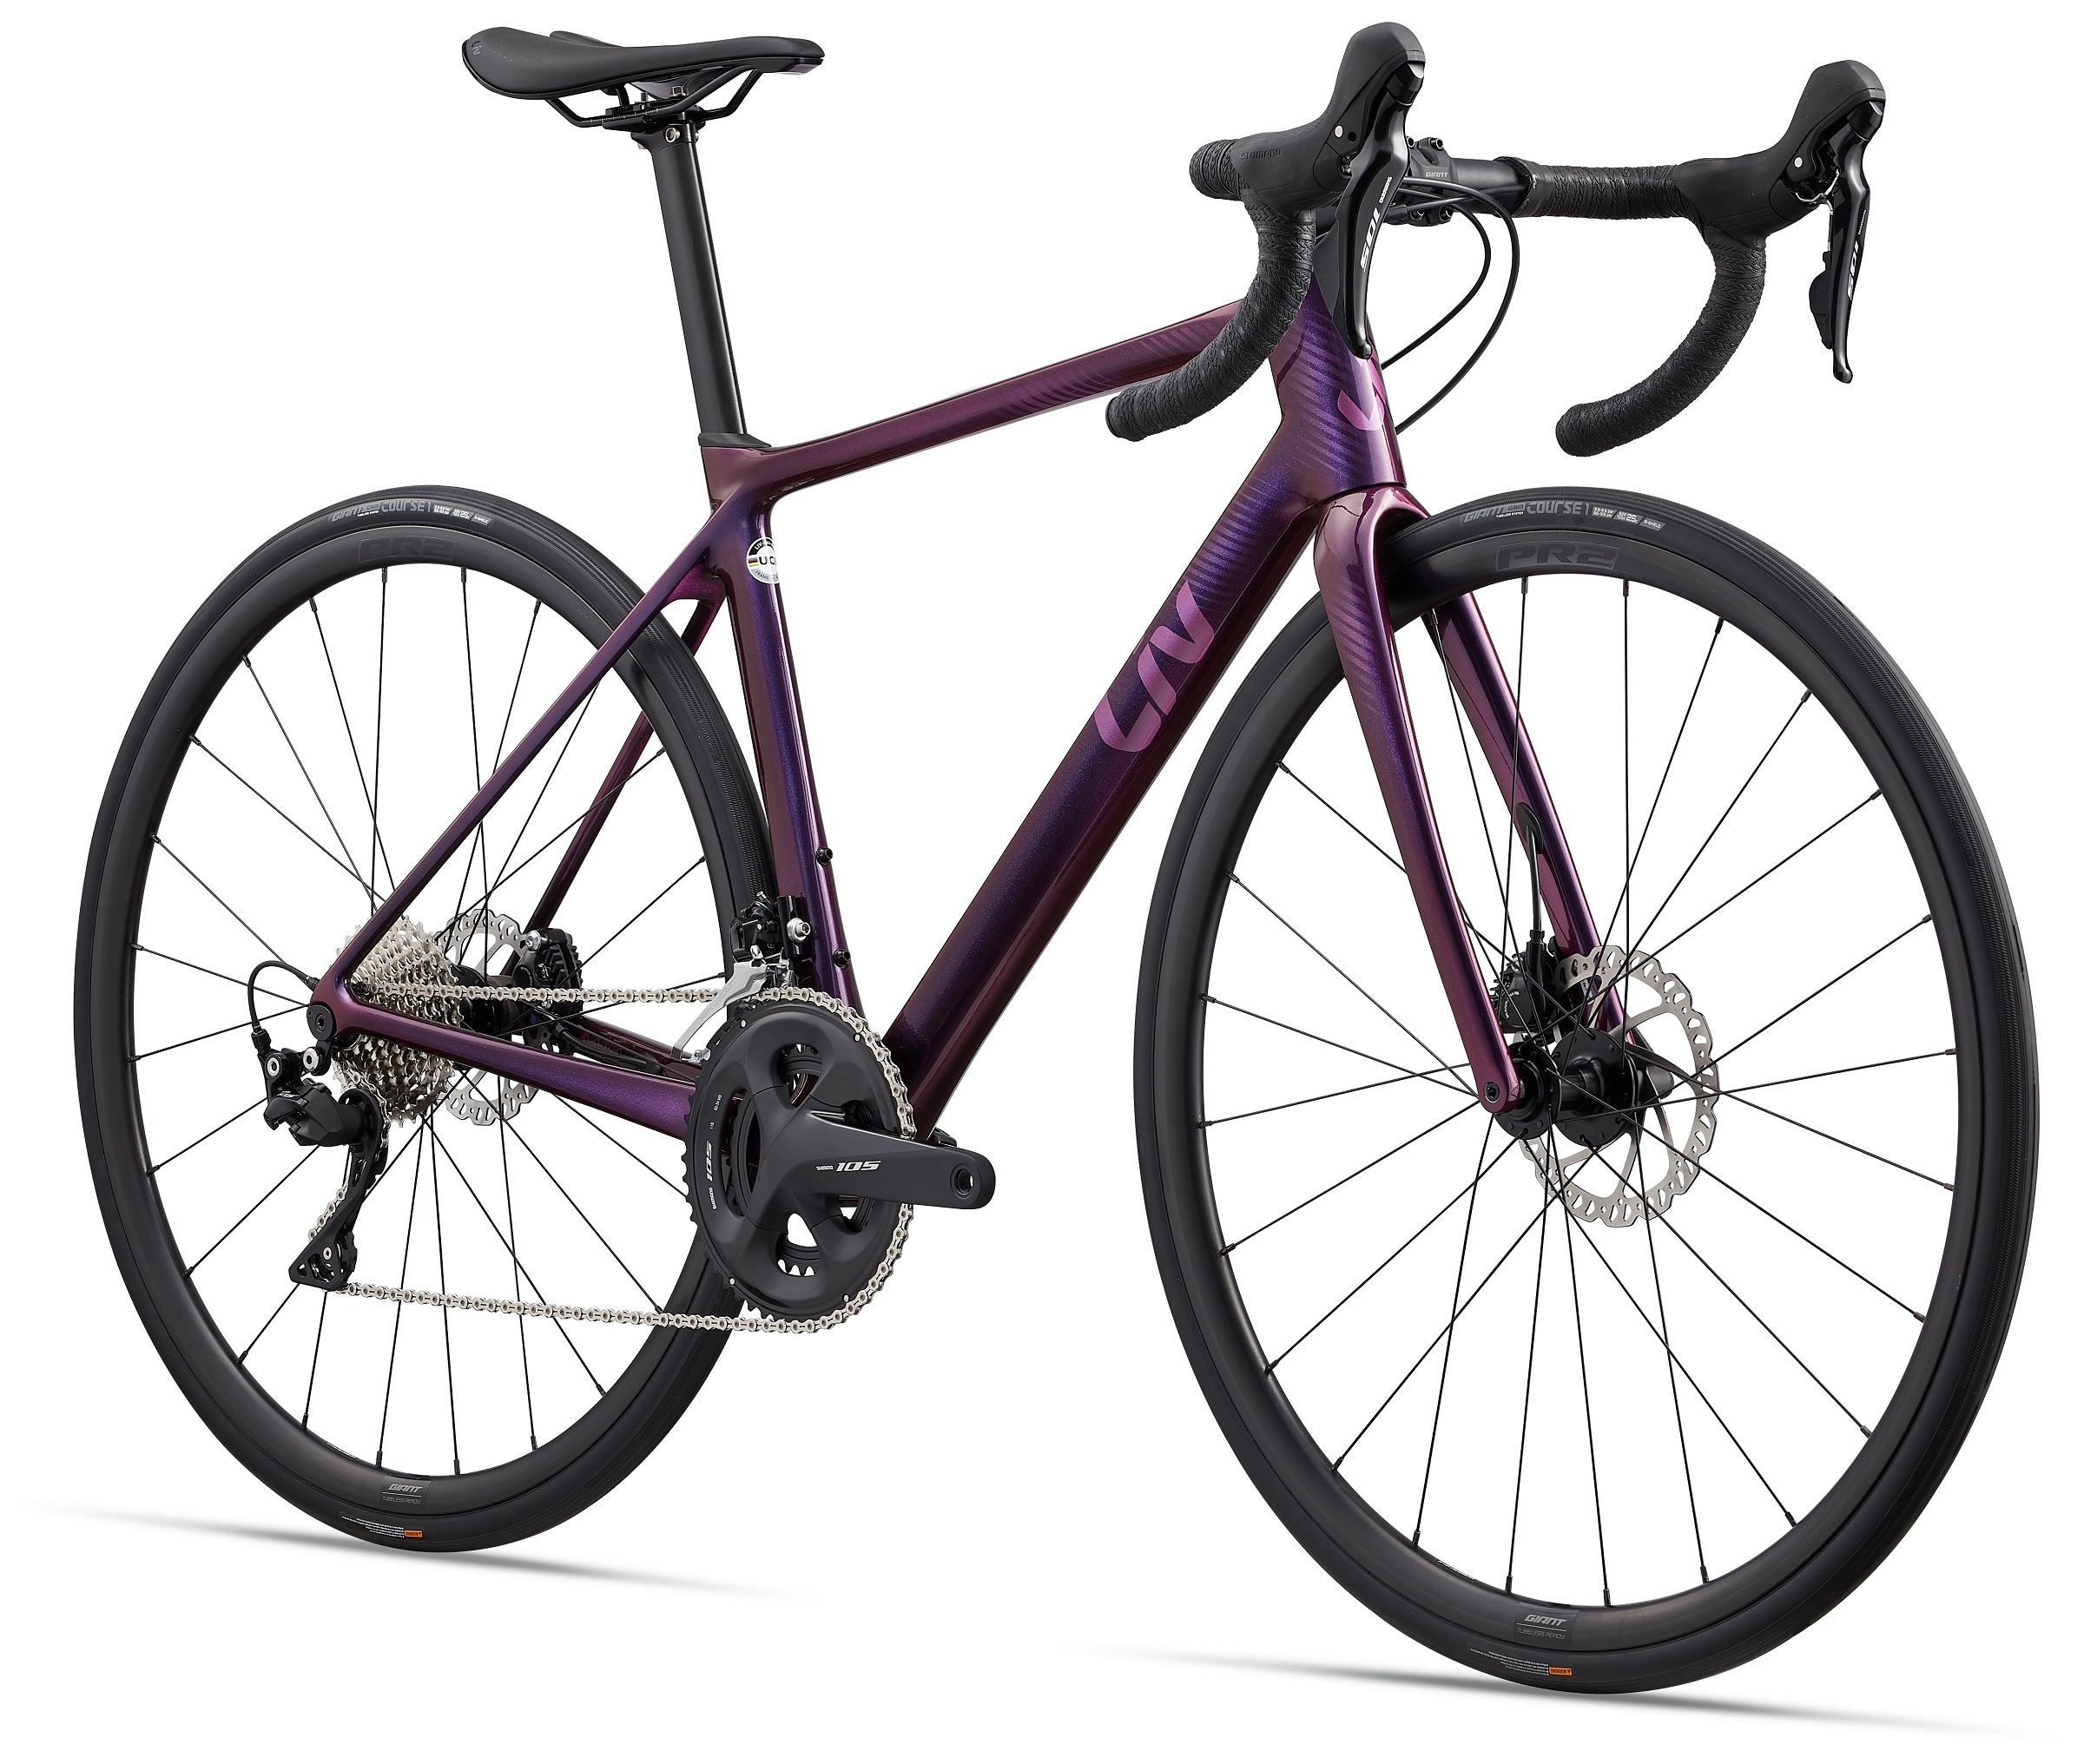 MY22 Langma Advanced 2 Disc-QOM_Color B Chameleon Purple_Frontxiaotu.jpg